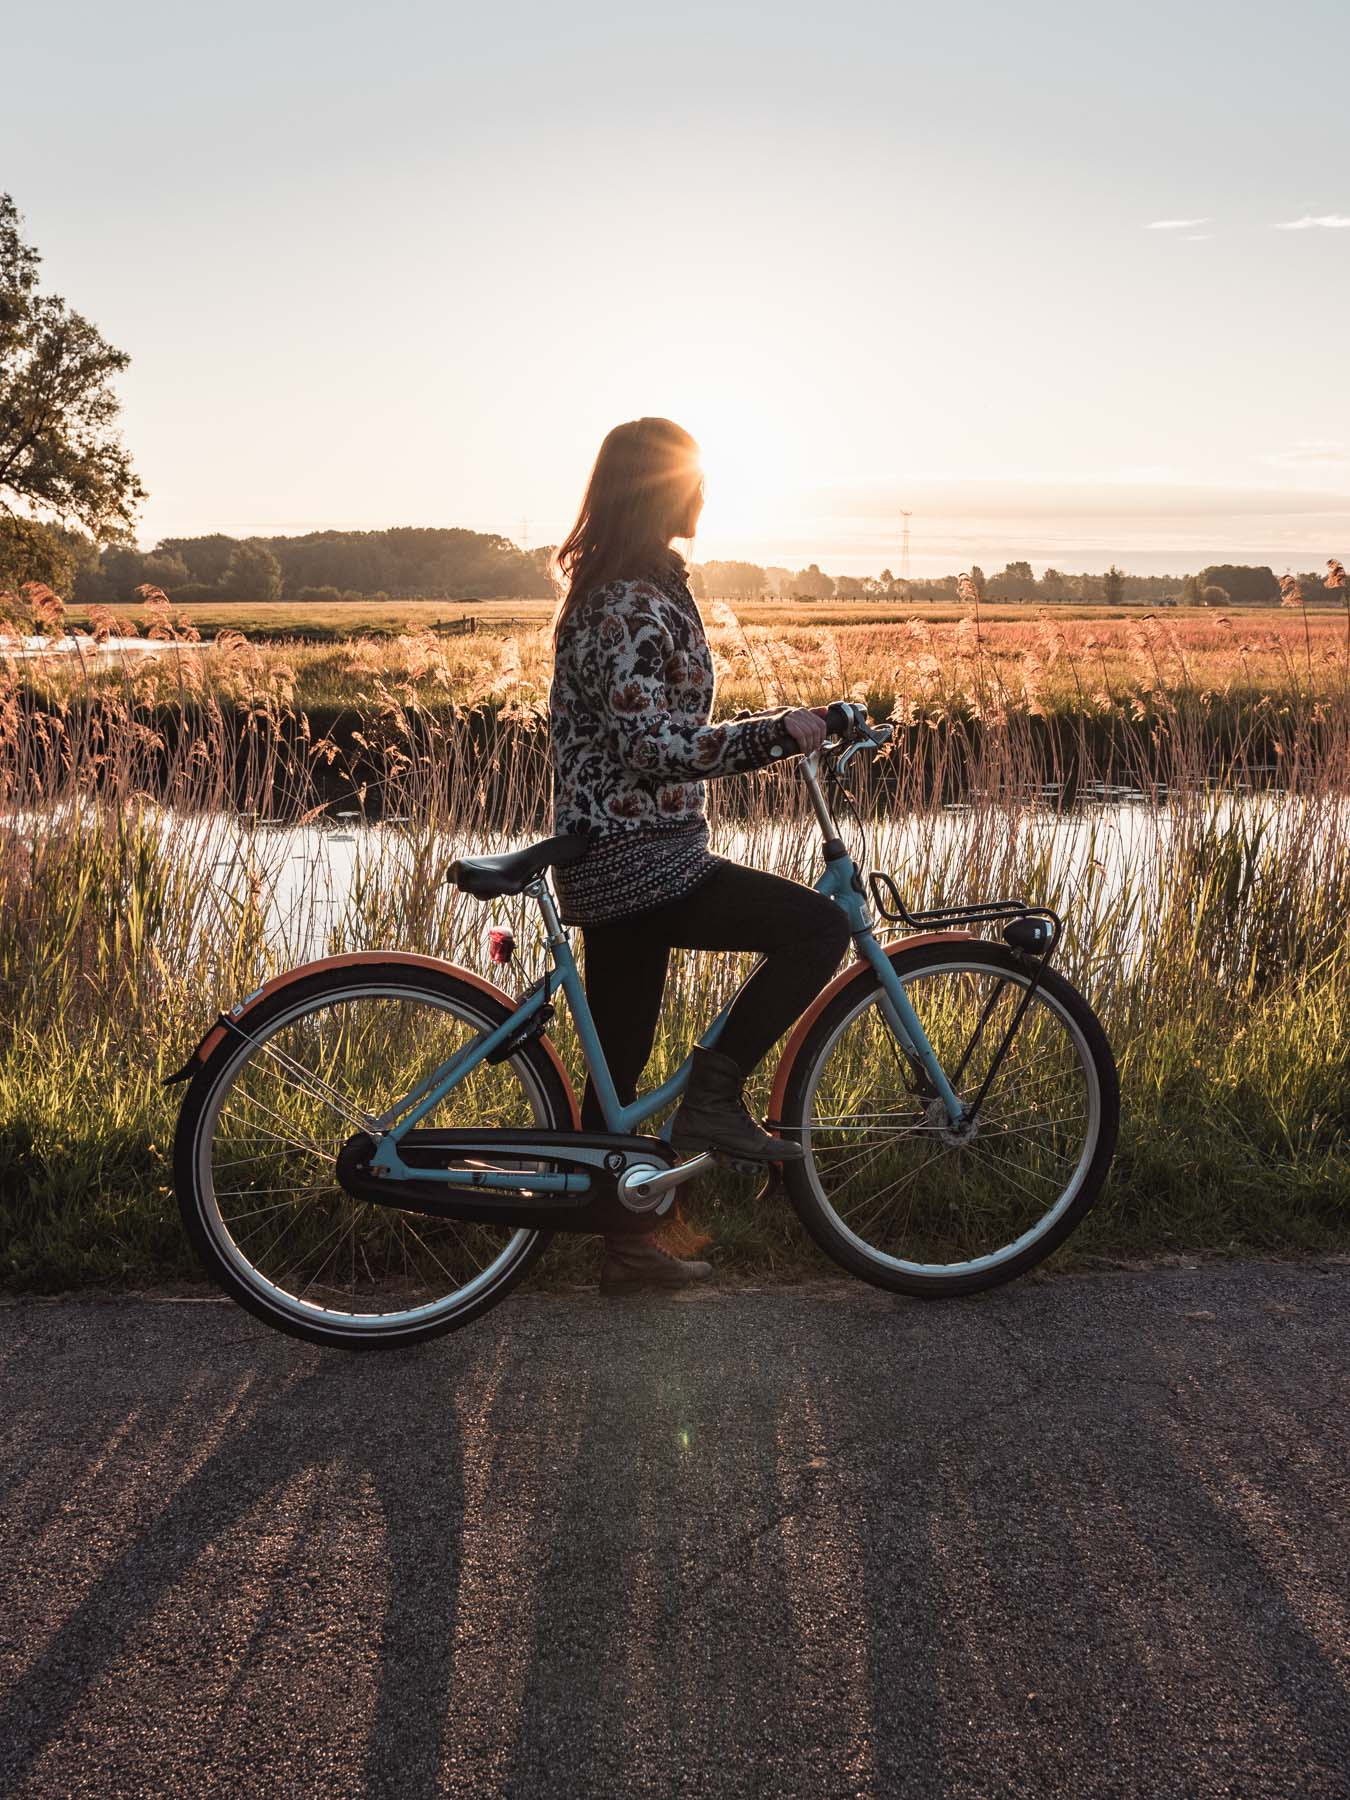 biesbosch rowery holandia